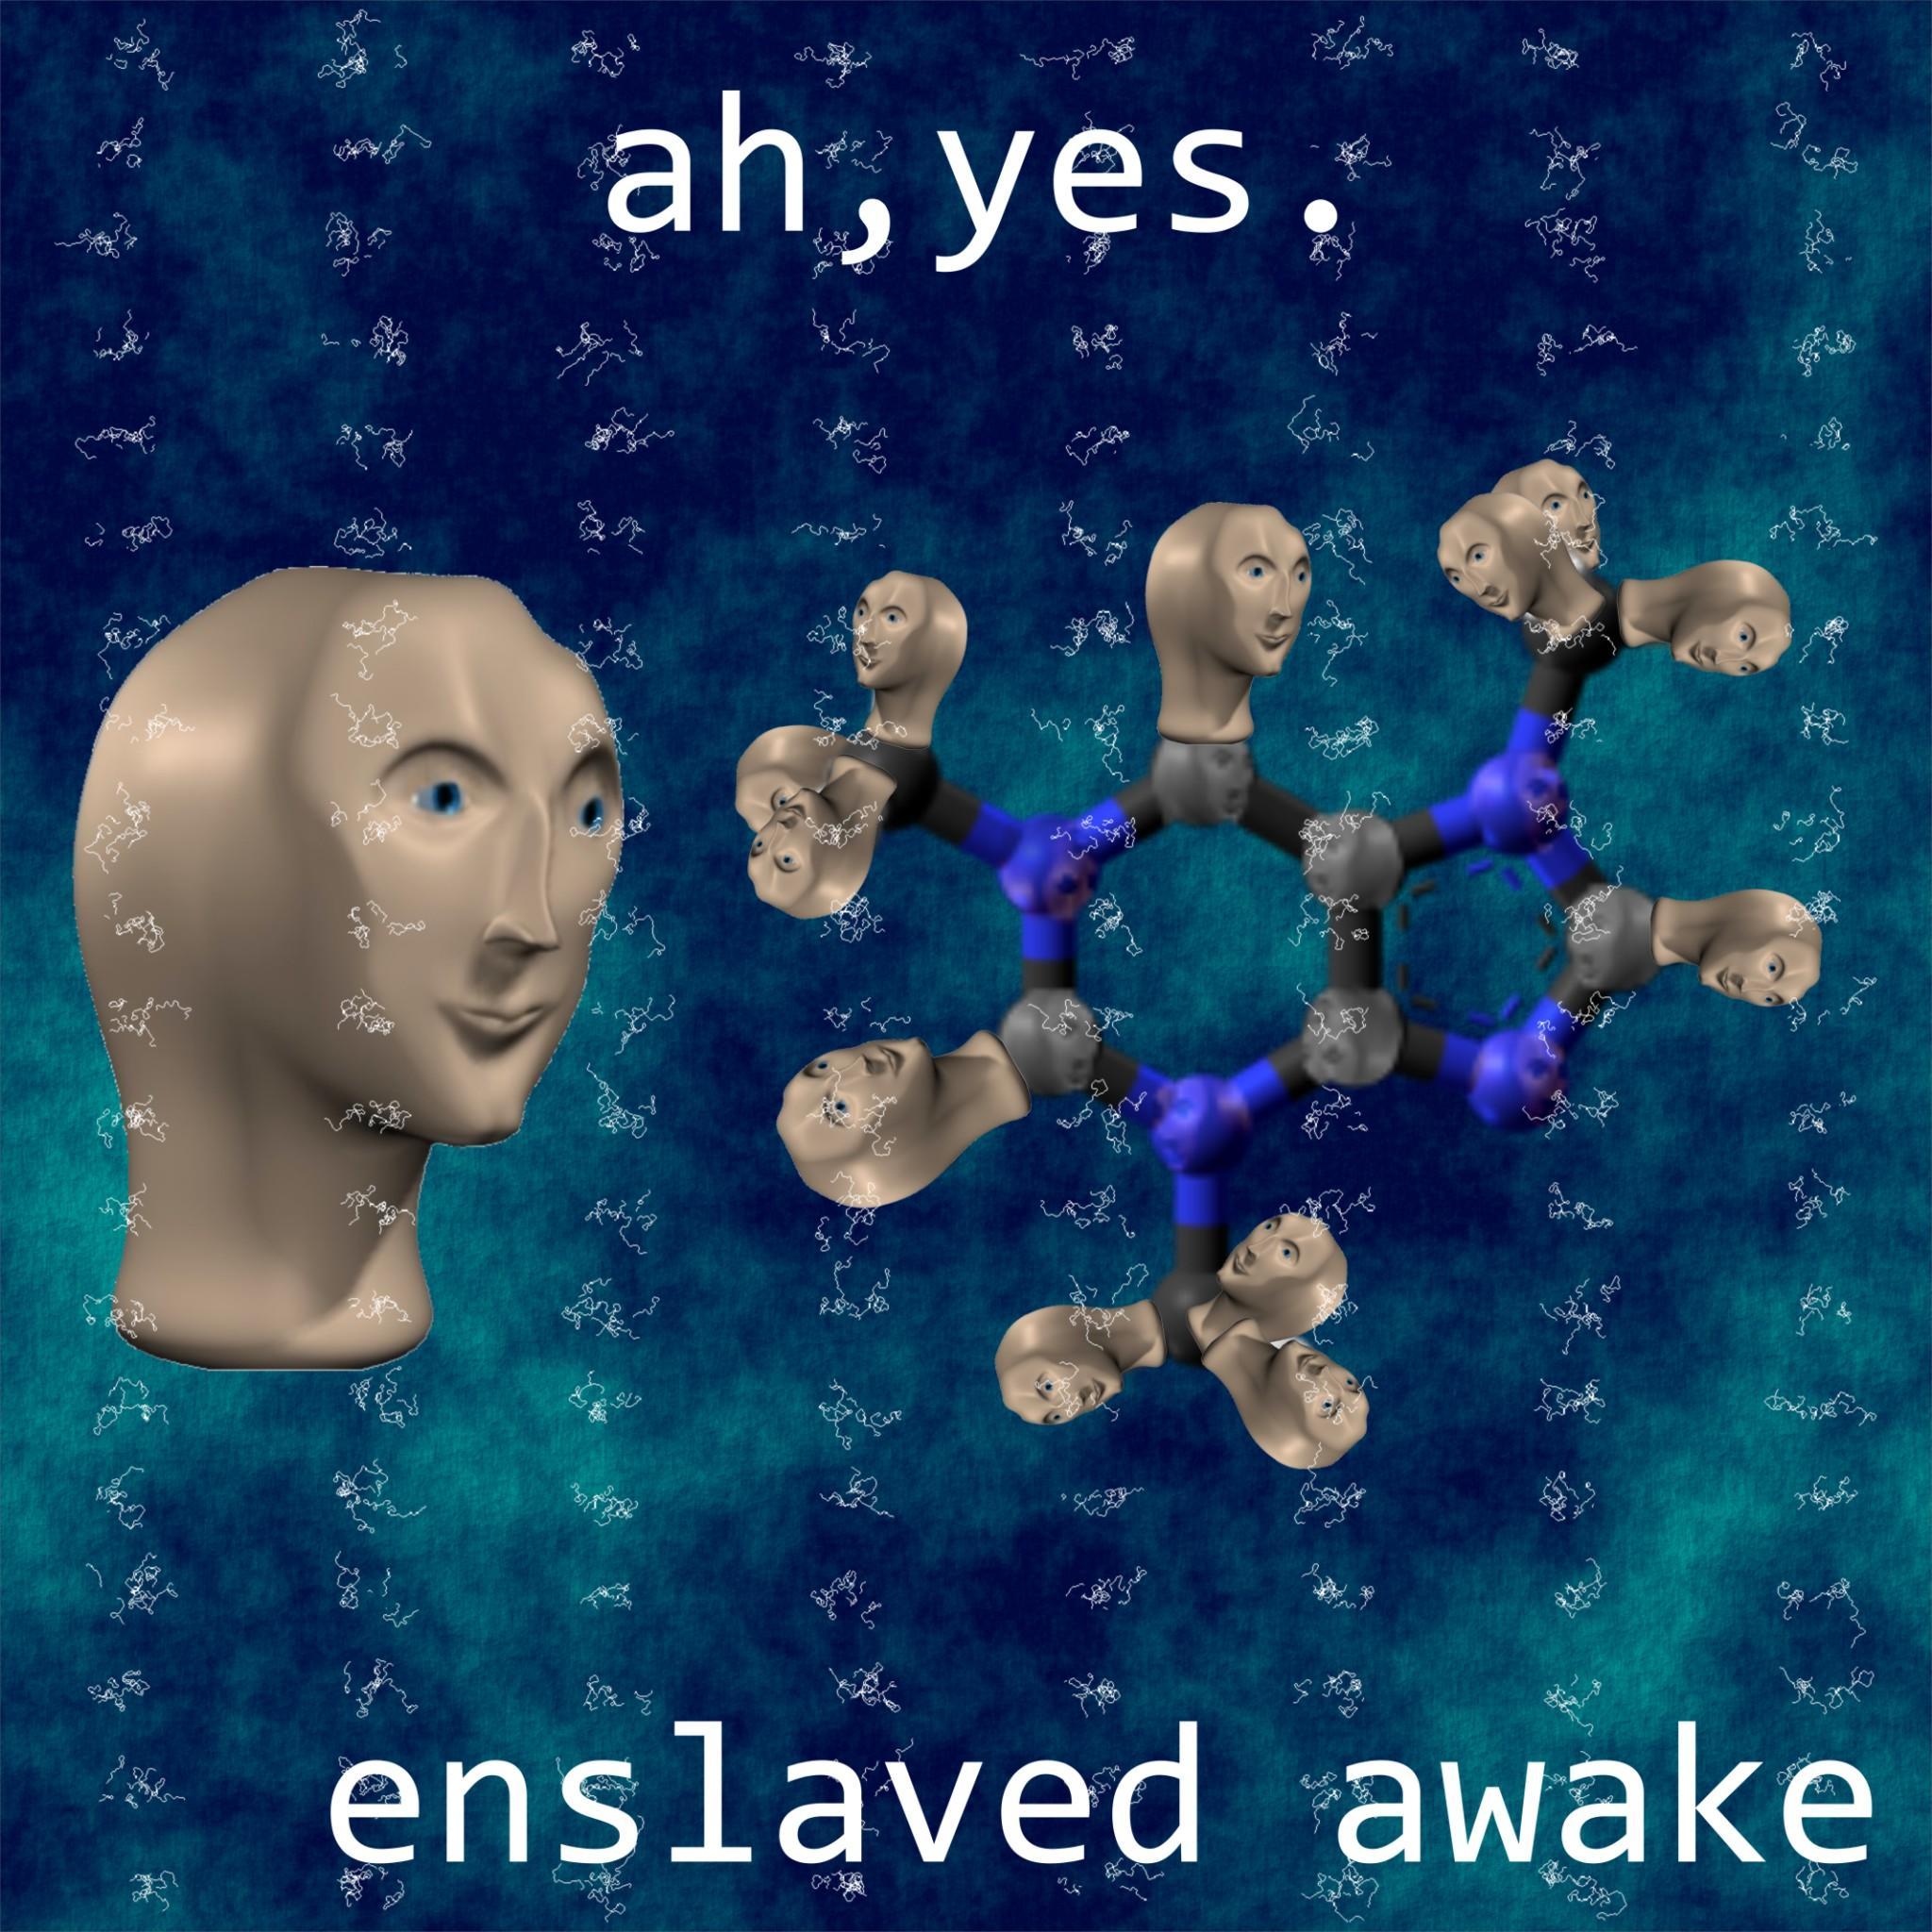 Oh No R Surrealmemes Surreal Memes Know Your Meme